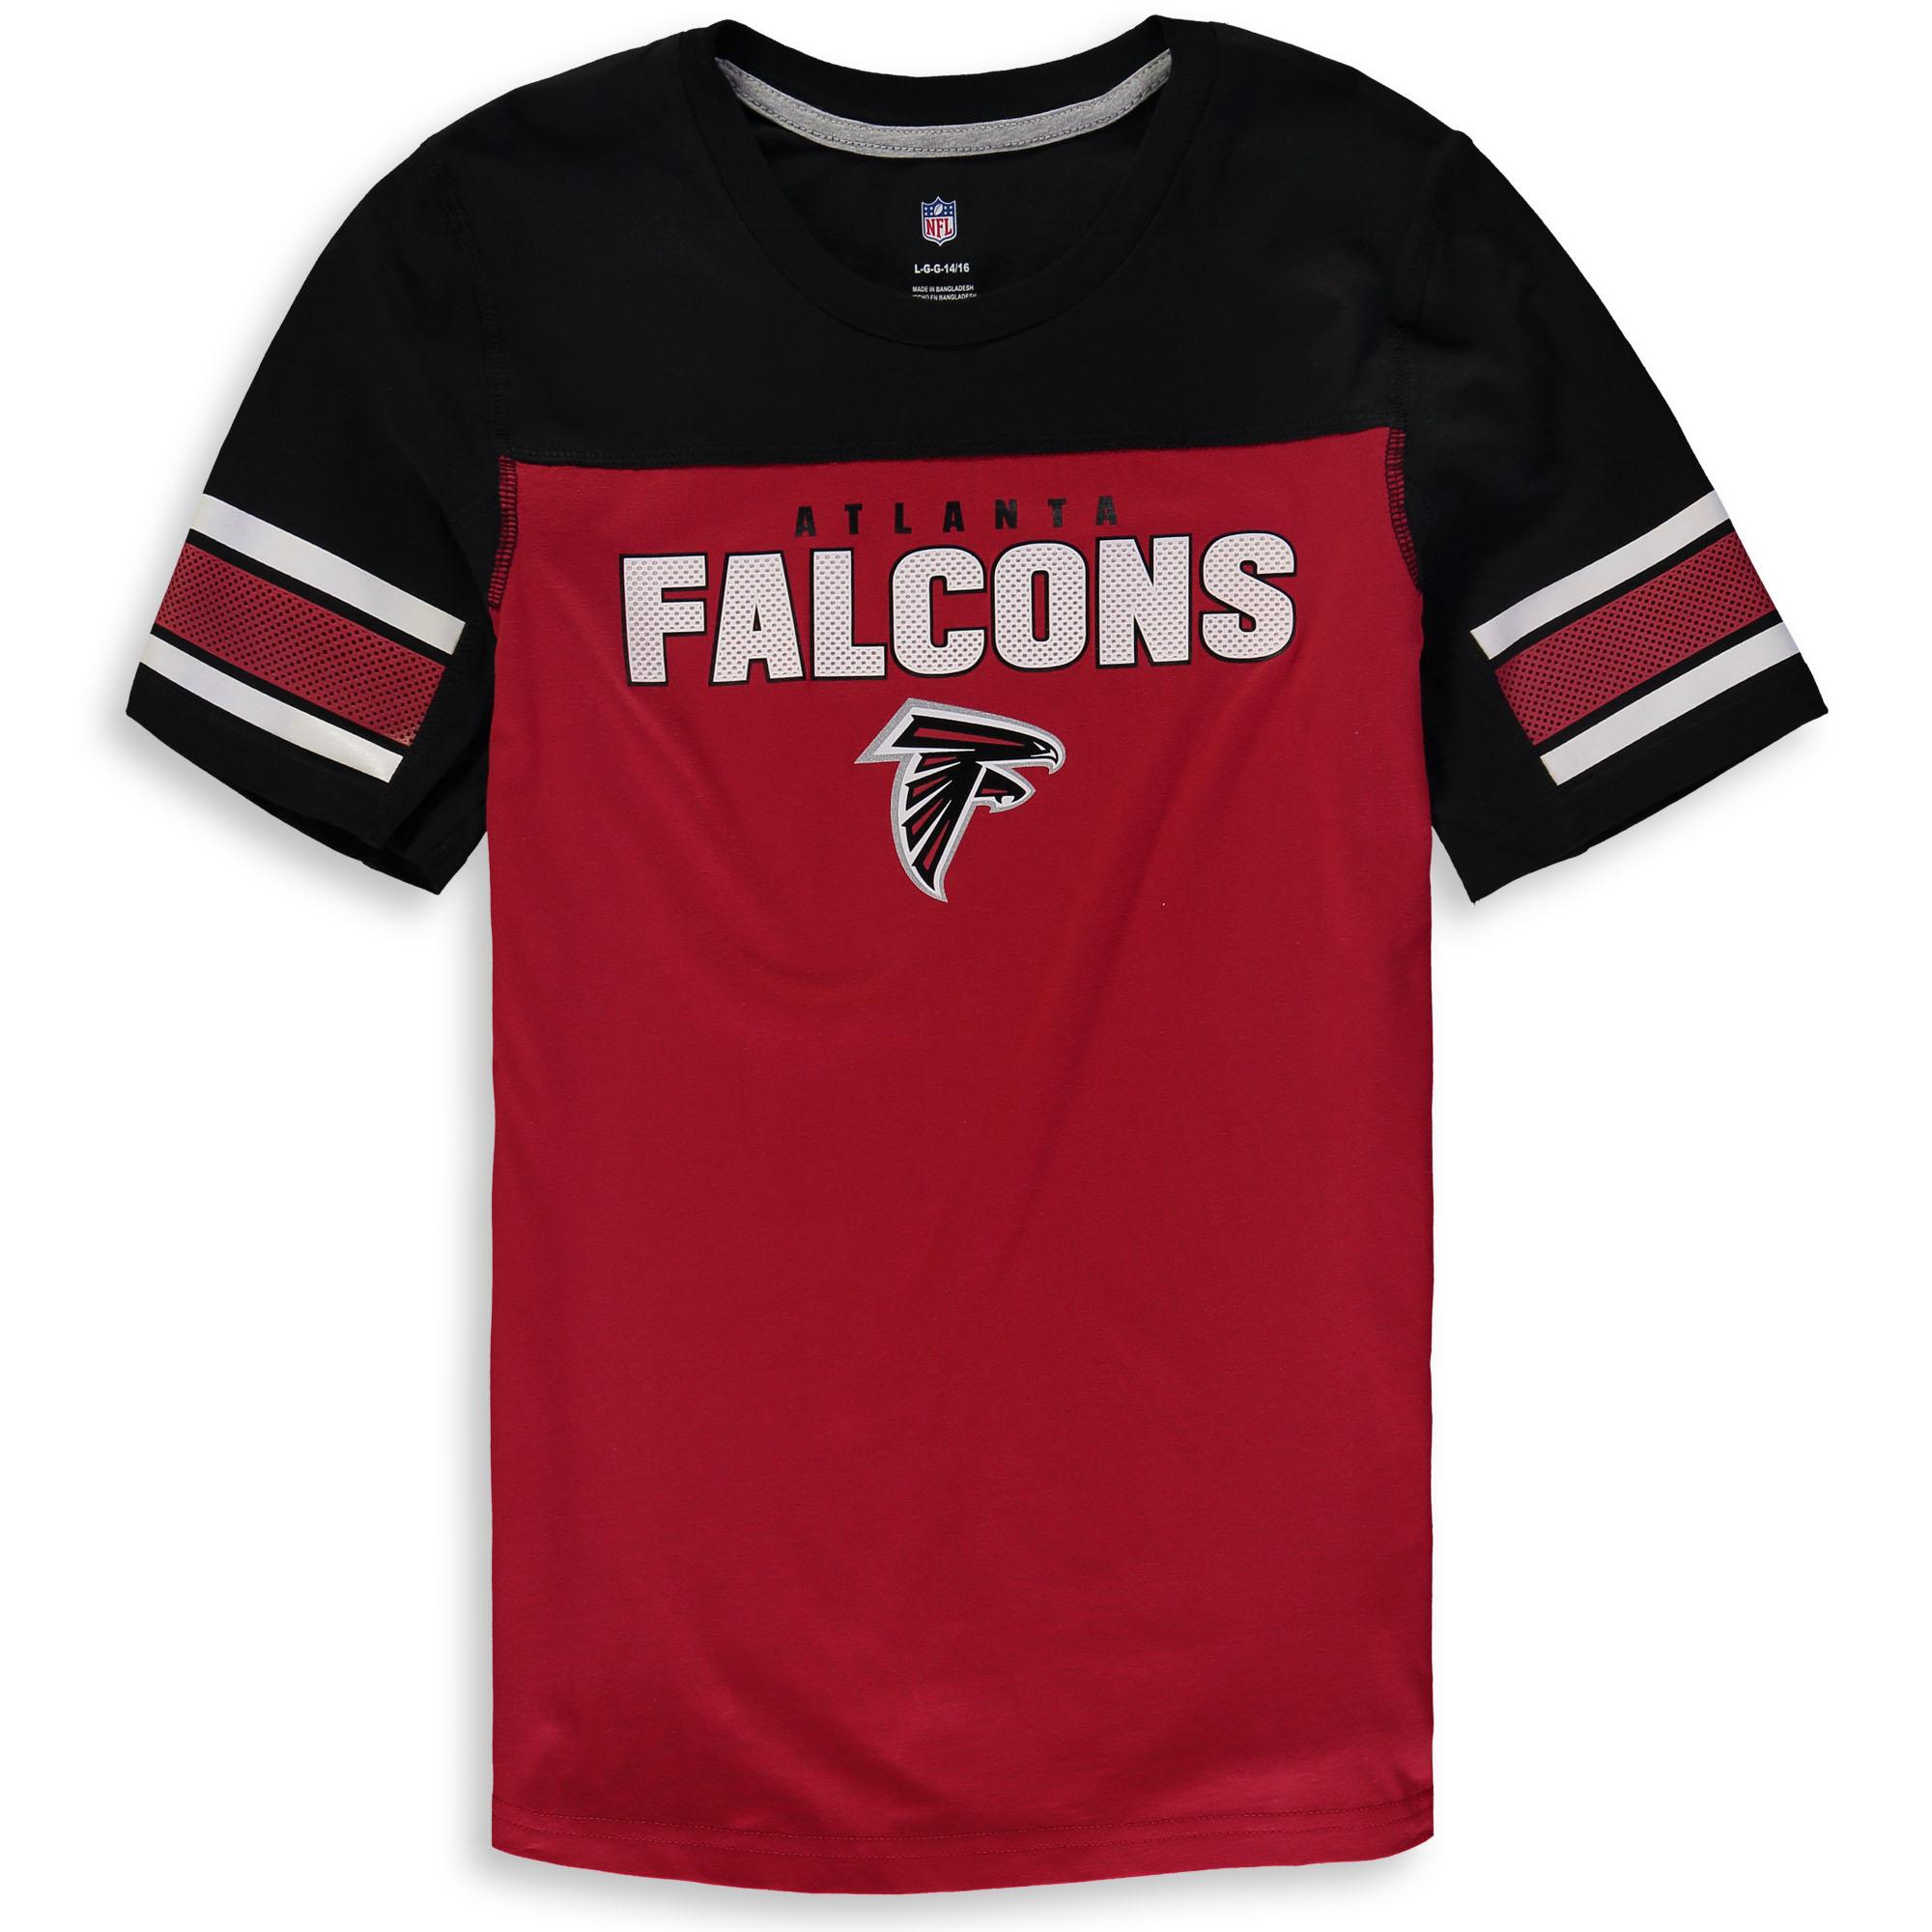 Atlanta Falcons Youth 50-Yard Dash T-Shirt - Red/Black